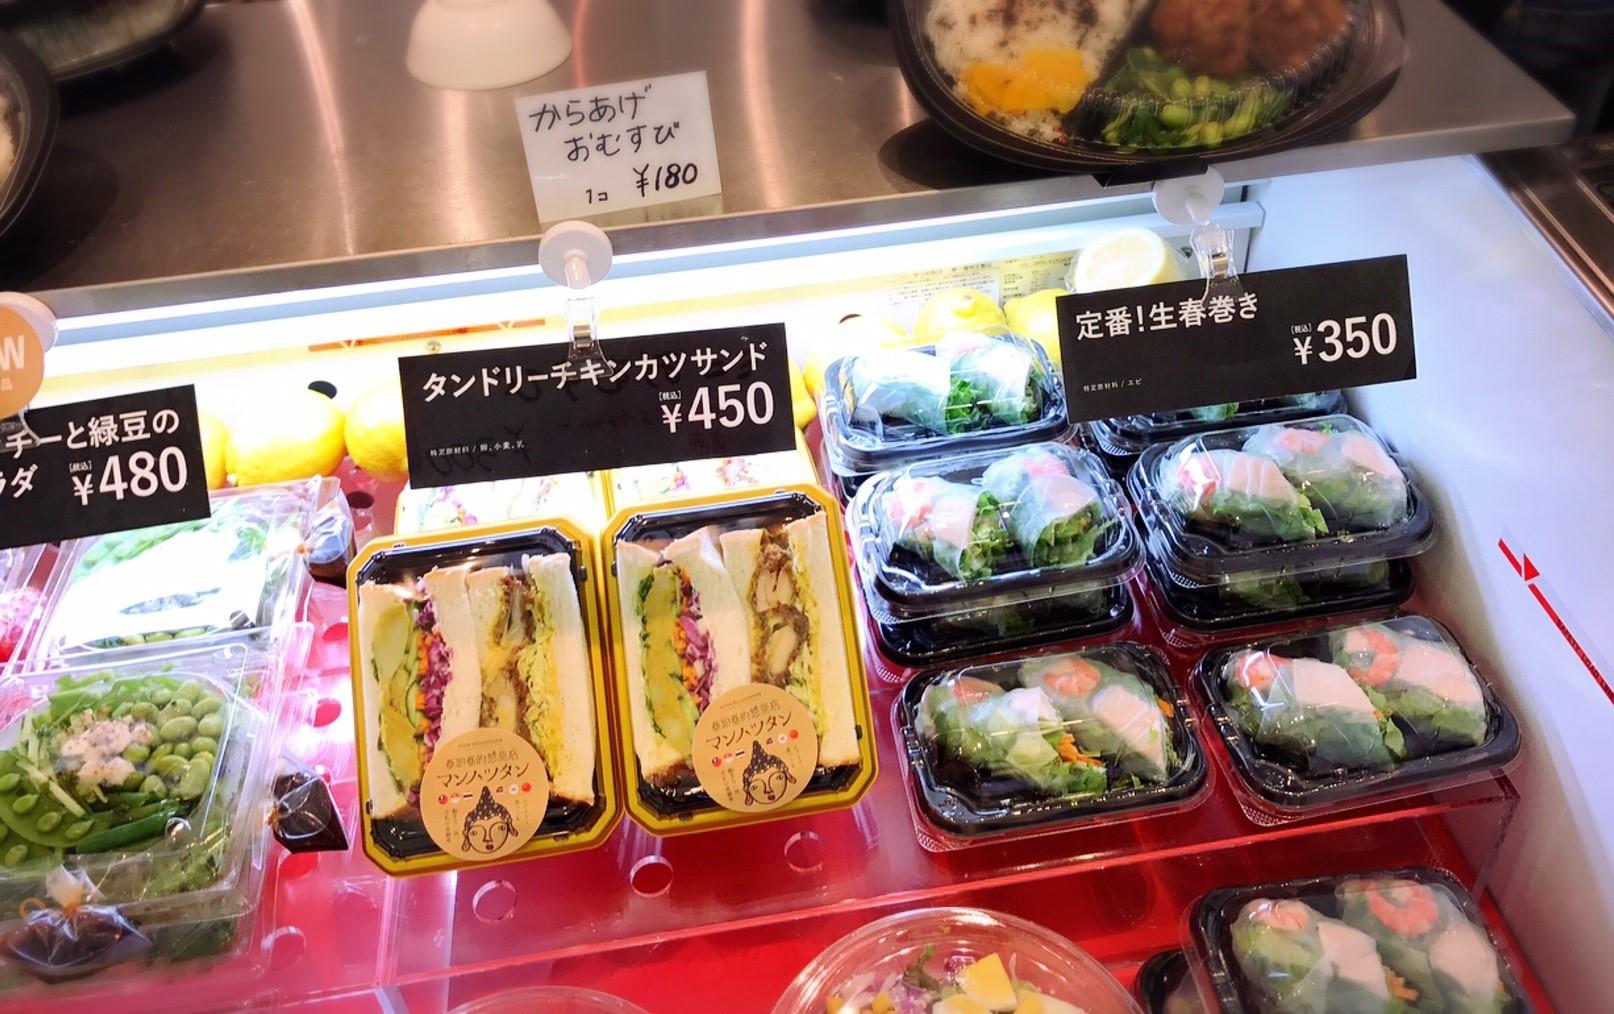 亜細亜的惣菜店 マンハッタン/札幌市 厚別区_c0378174_13105390.jpg